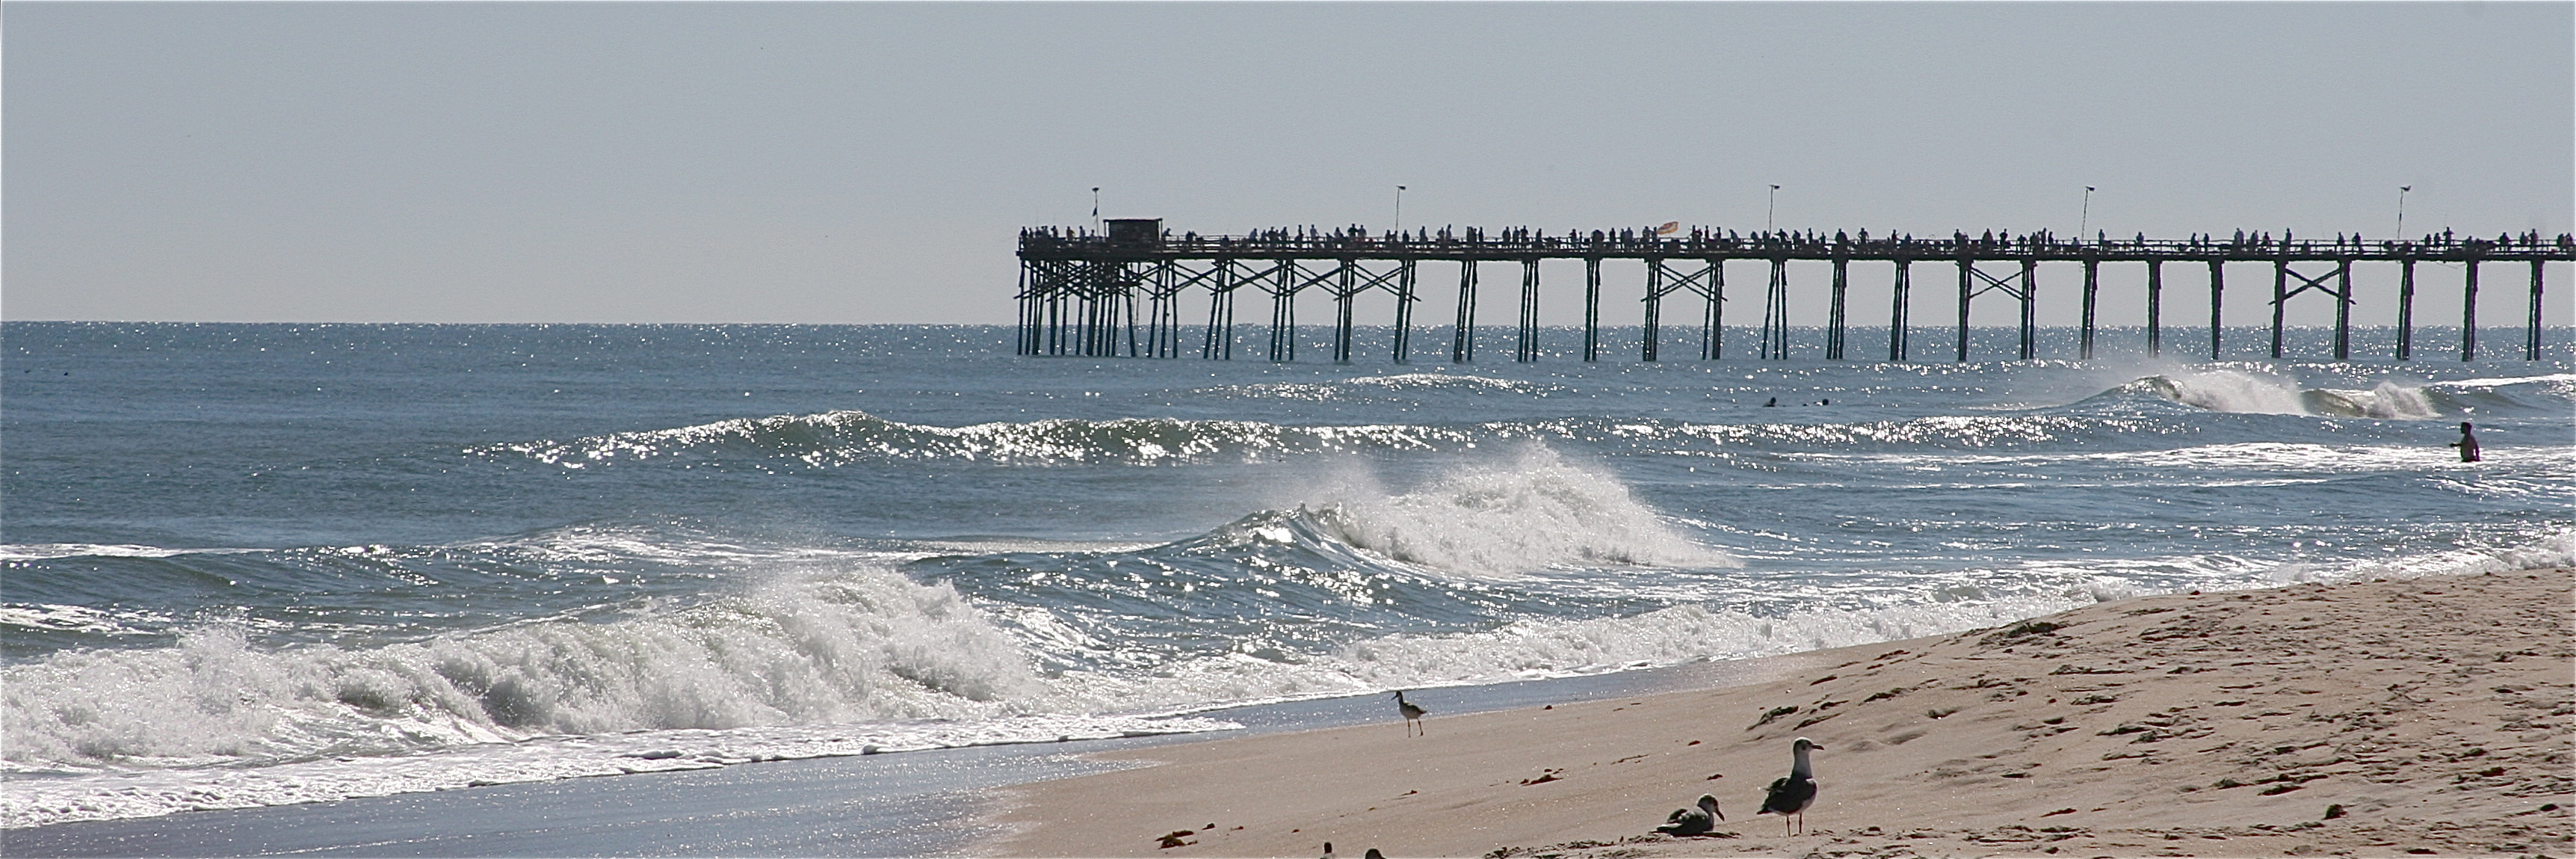 pier-beach.jpg